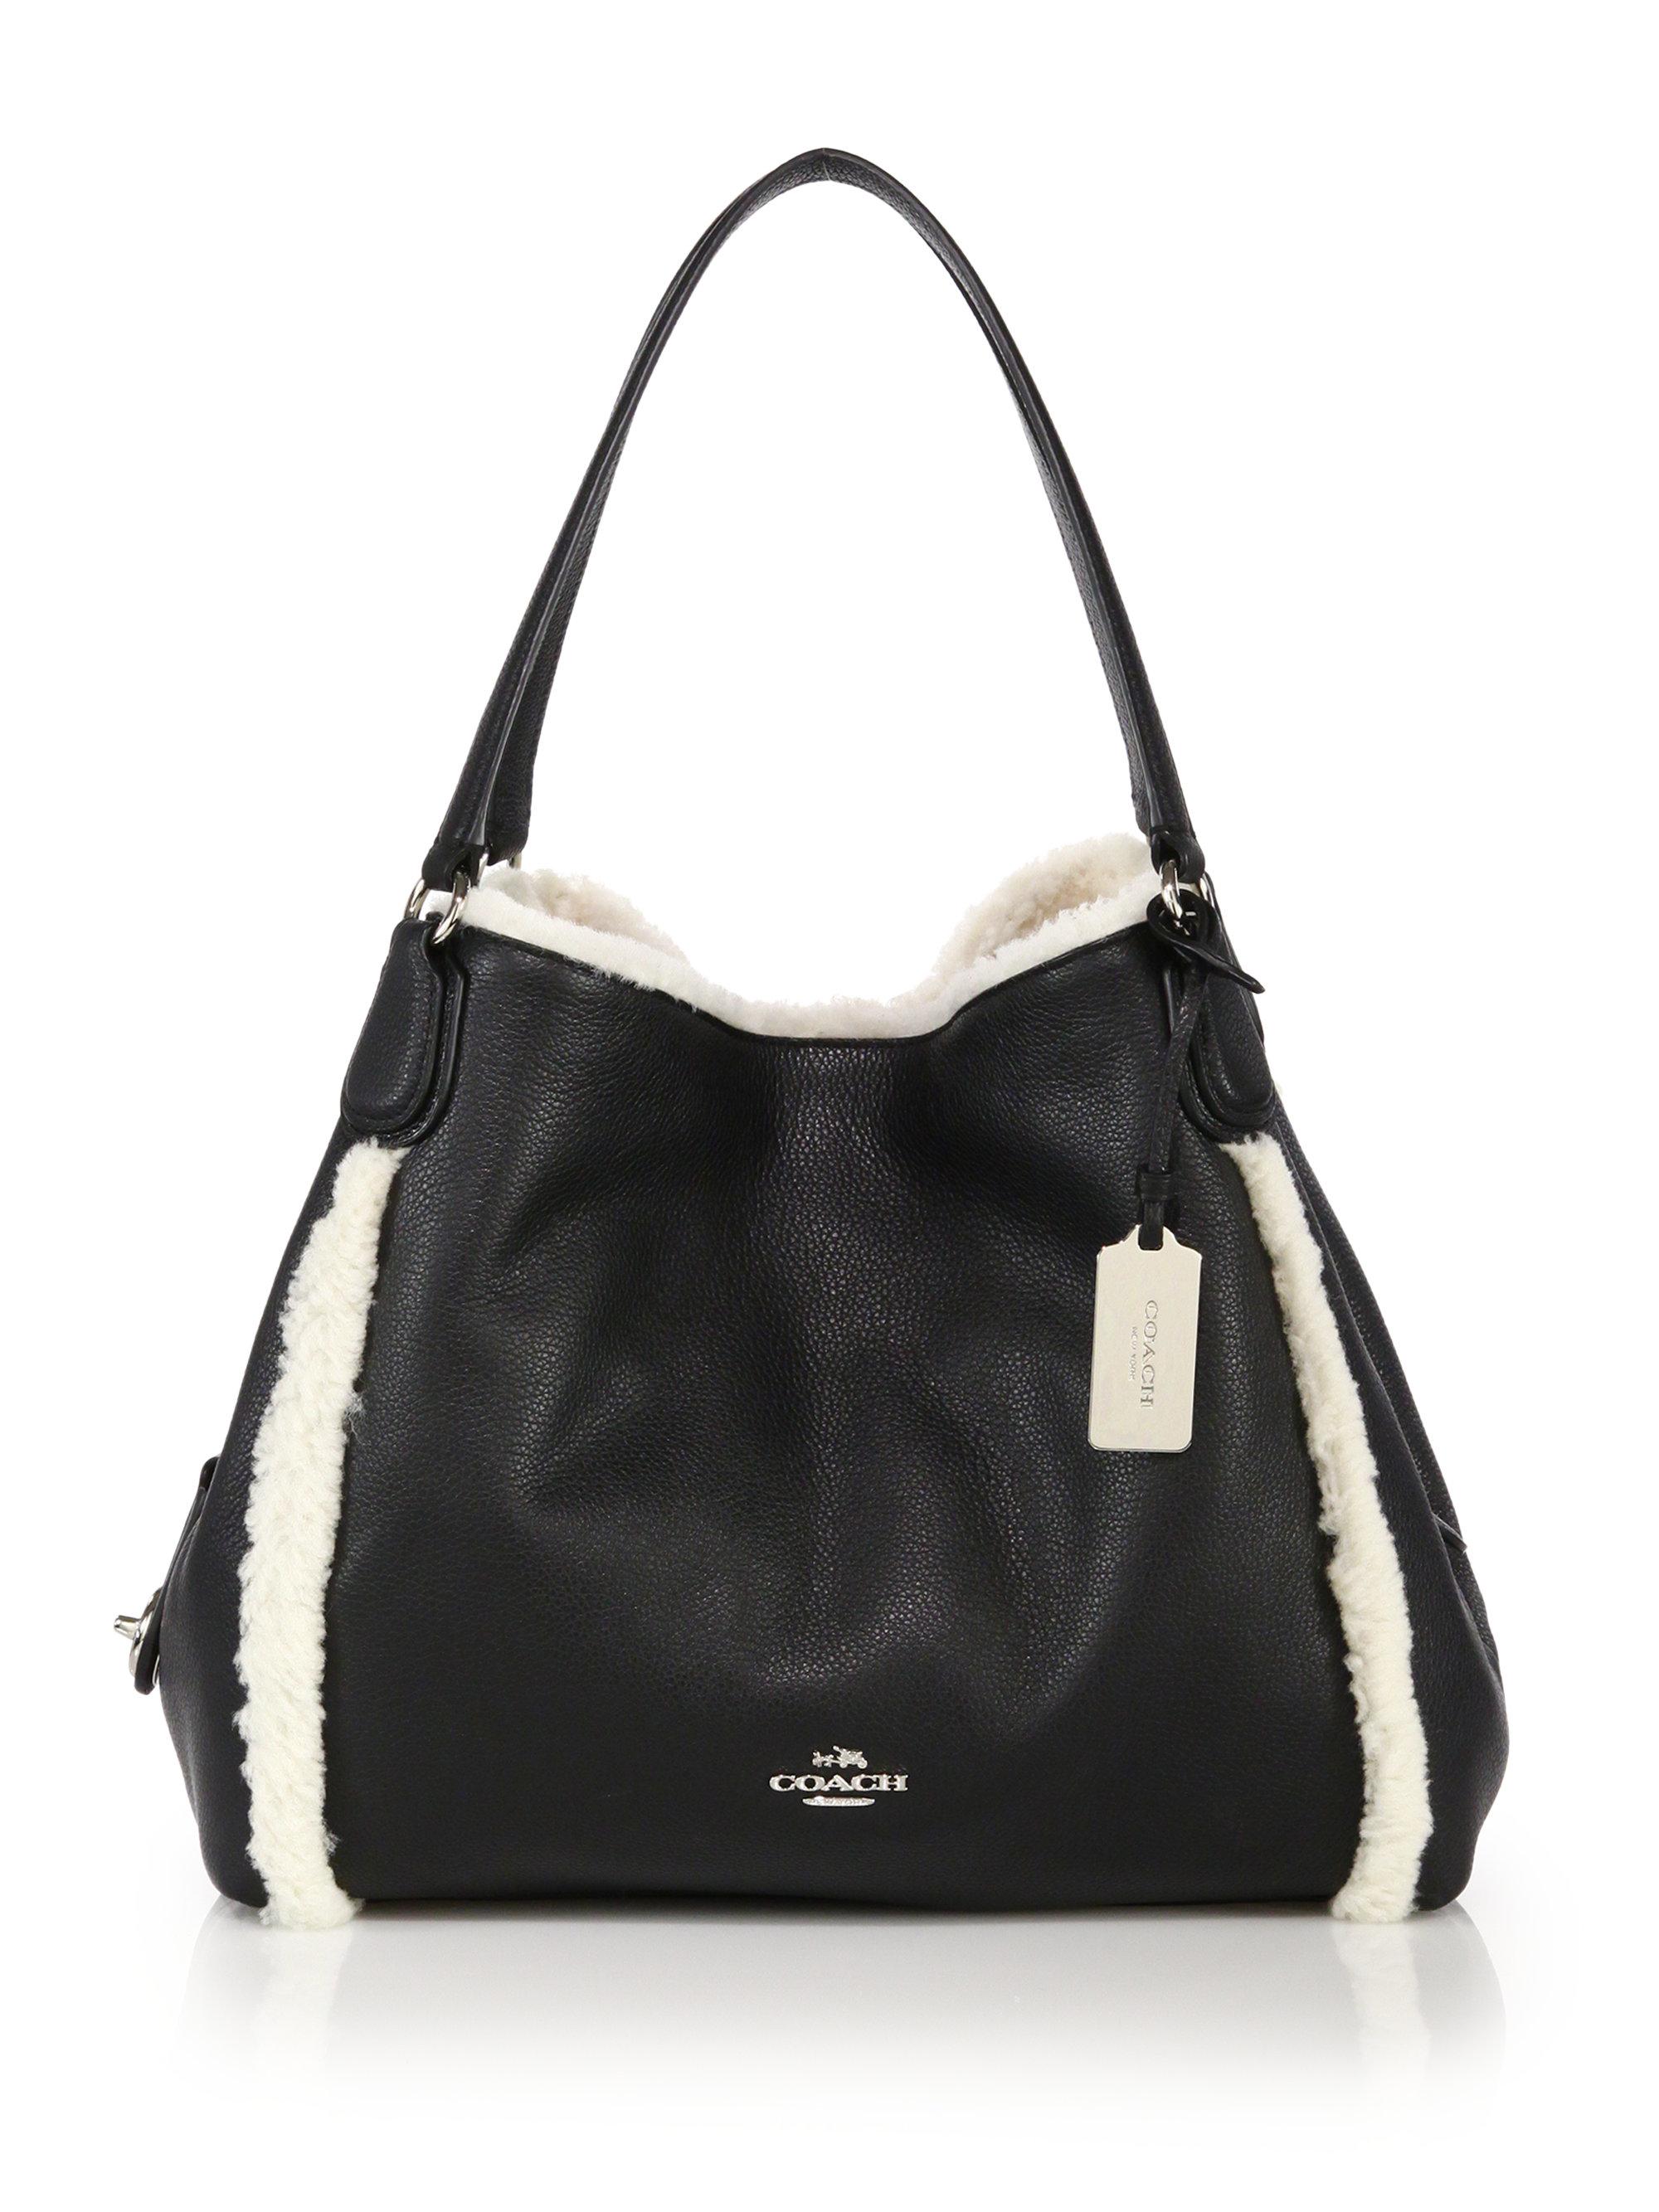 Coach Edie Shearling & Leather Shoulder Bag in Black | Lyst